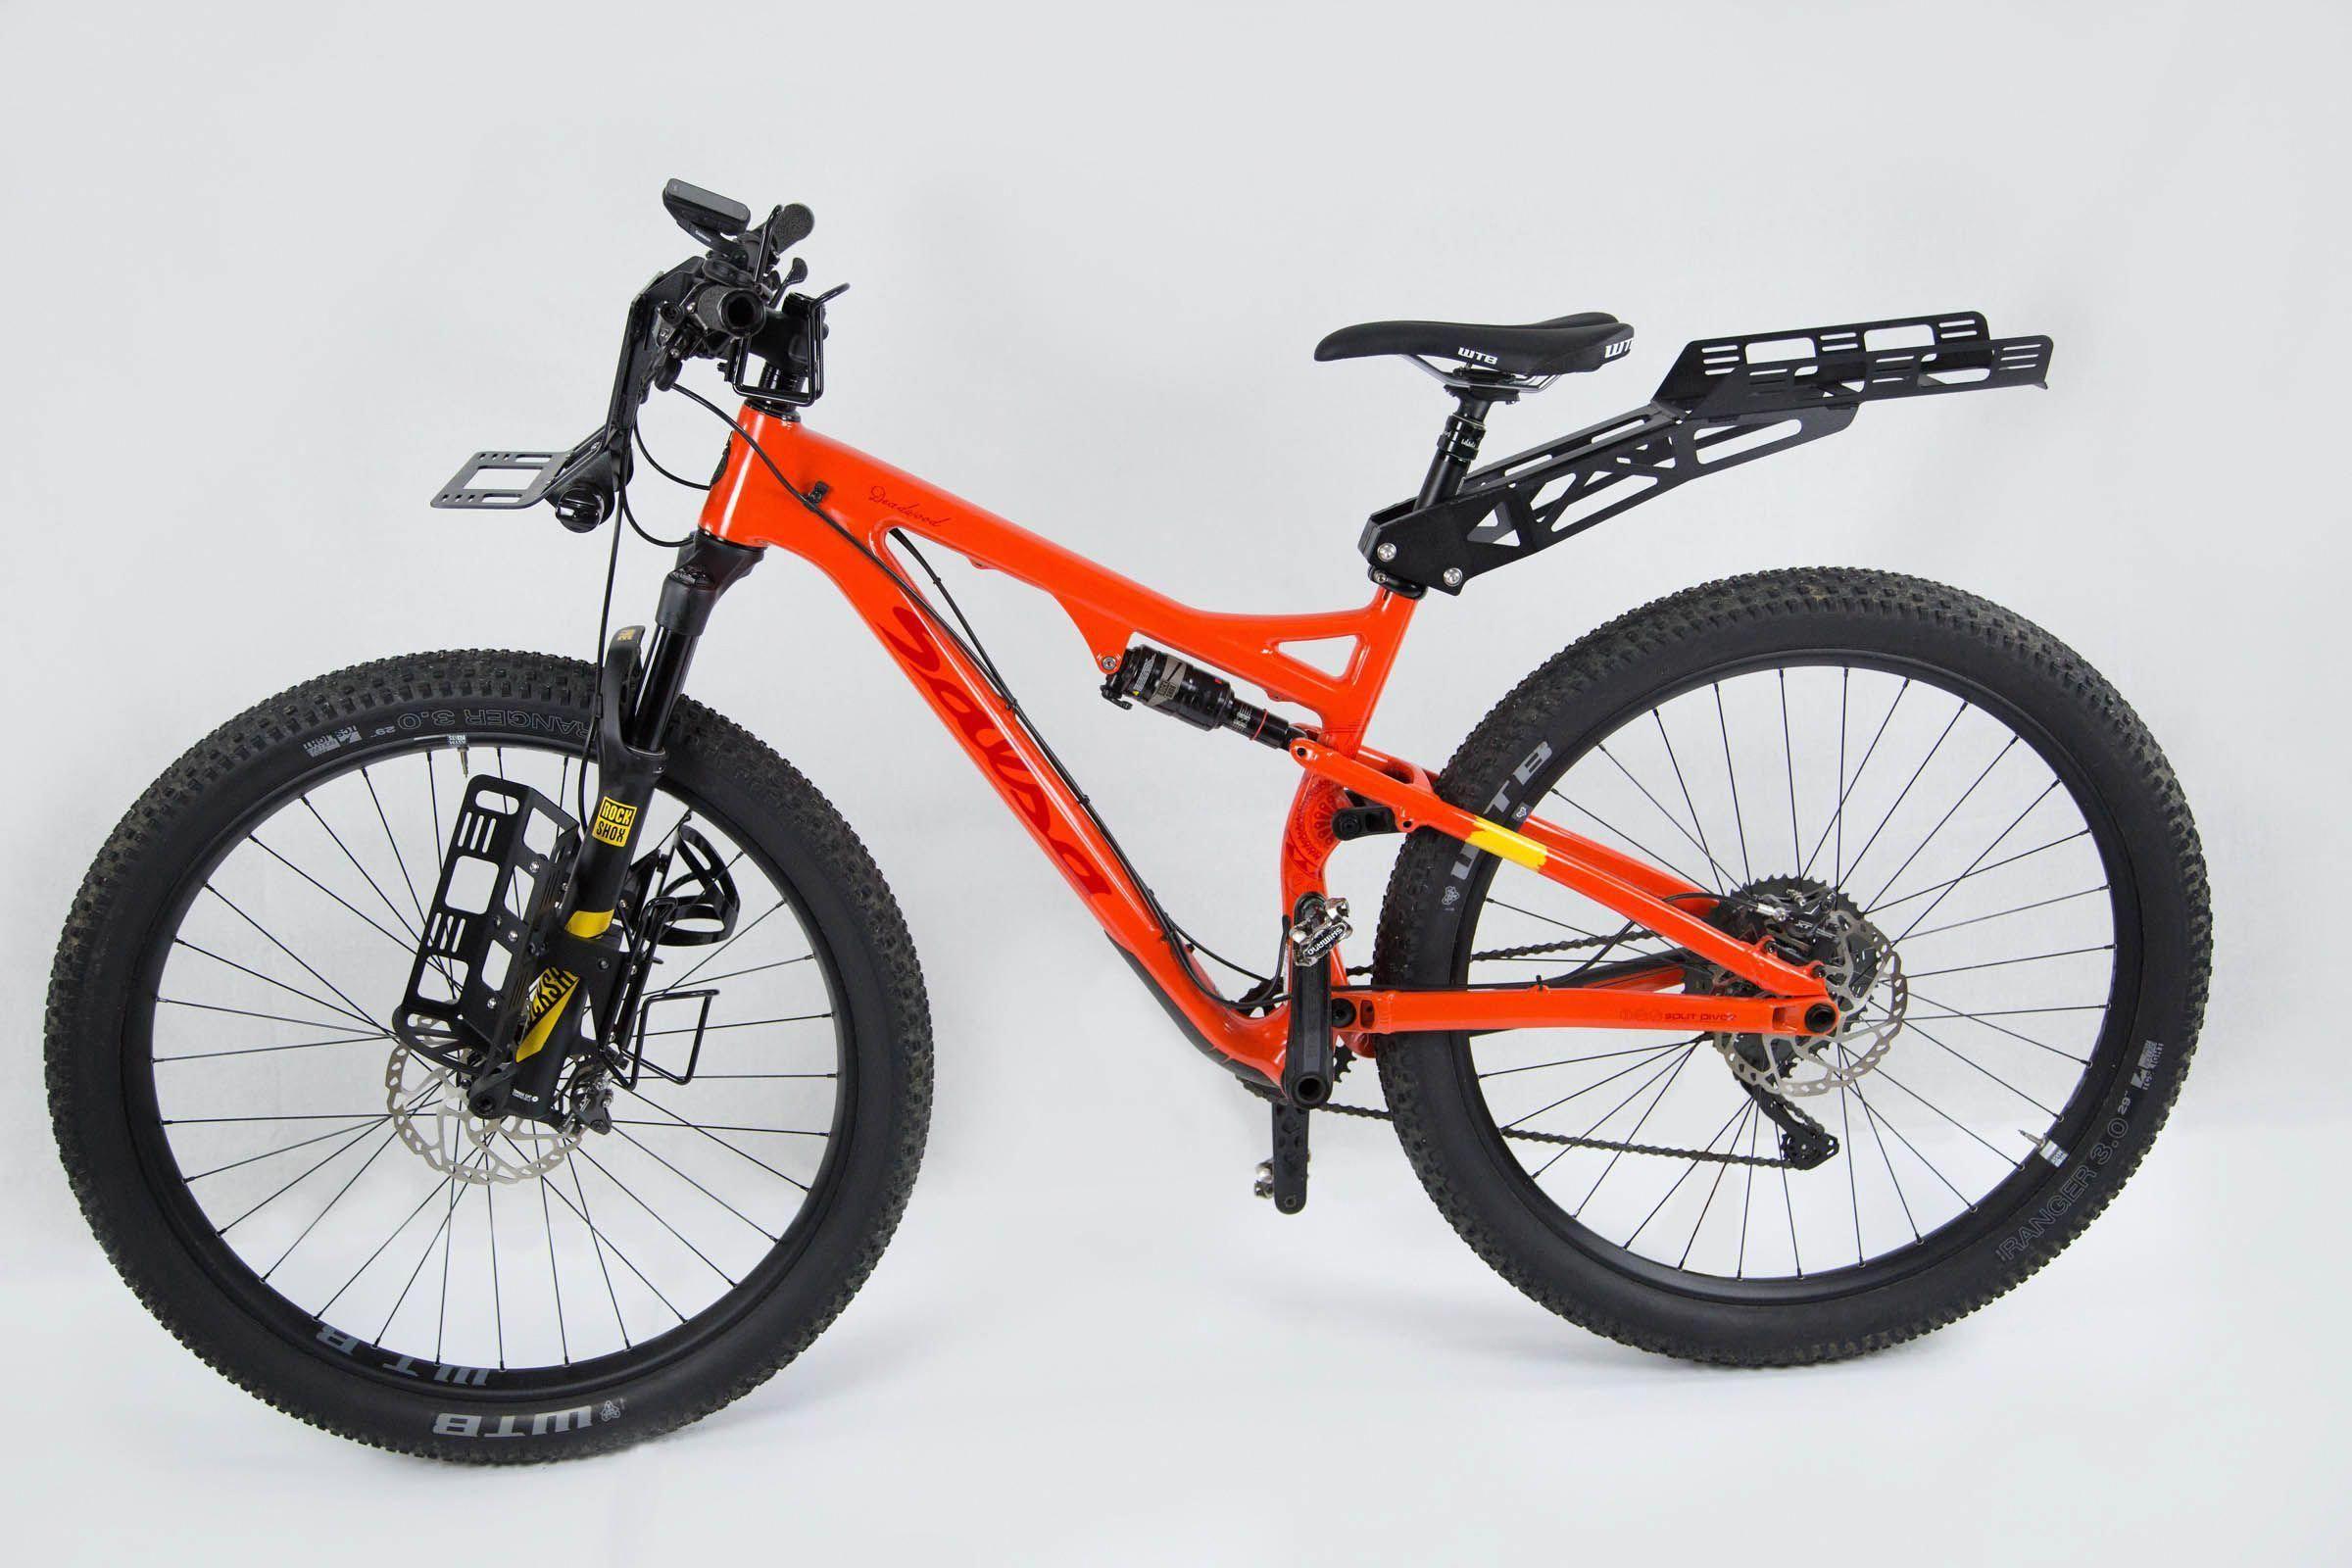 The Best Ways To Purchase A Mountain Bike In 2020 Bike Gear